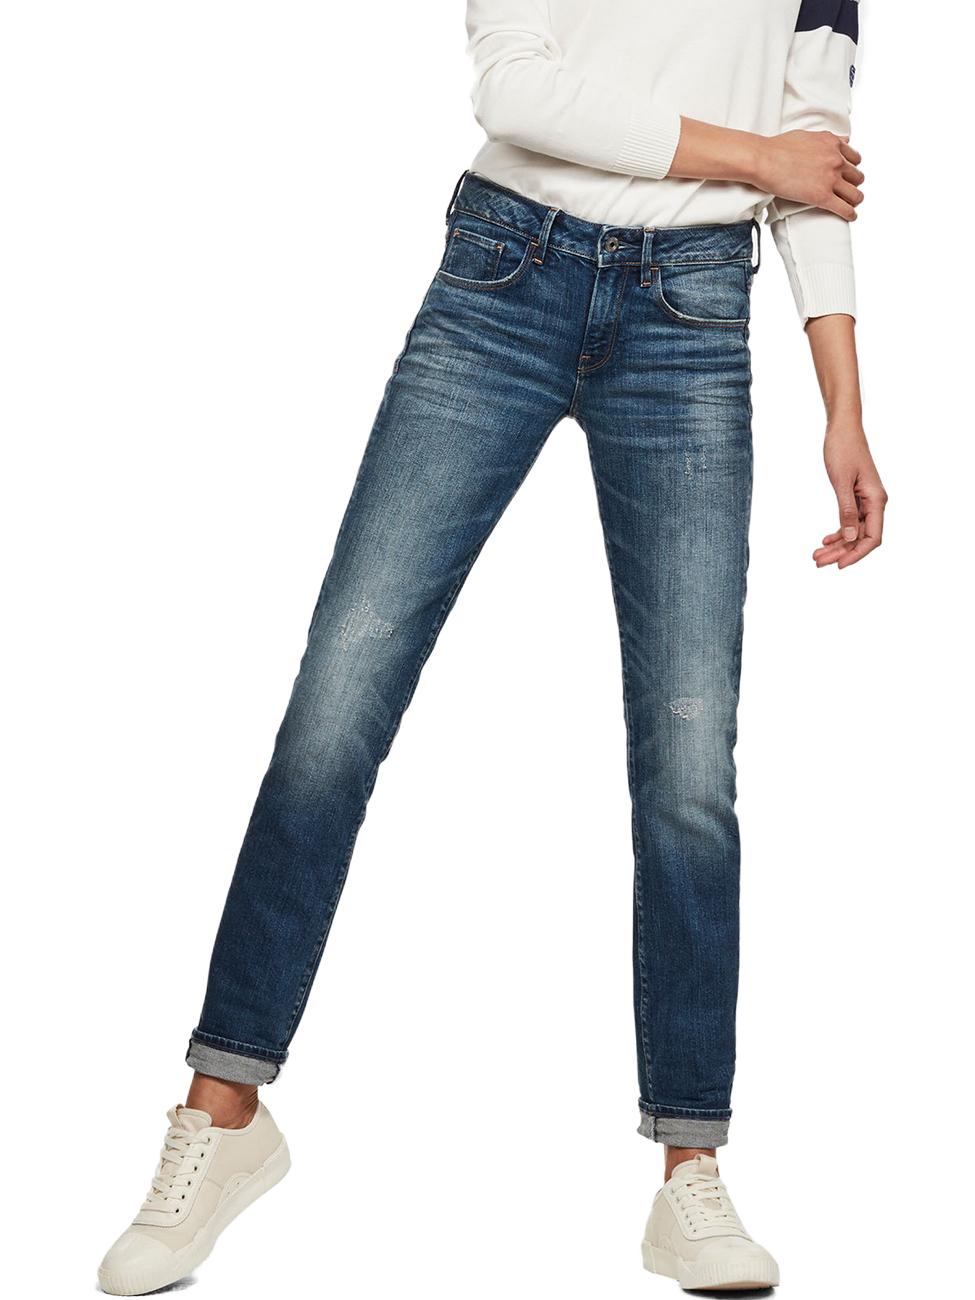 627170821c16 G-Star Damen Jeans 3301 Deconstructed Mid Waist Straight Fit - Blau -  Medium Aged